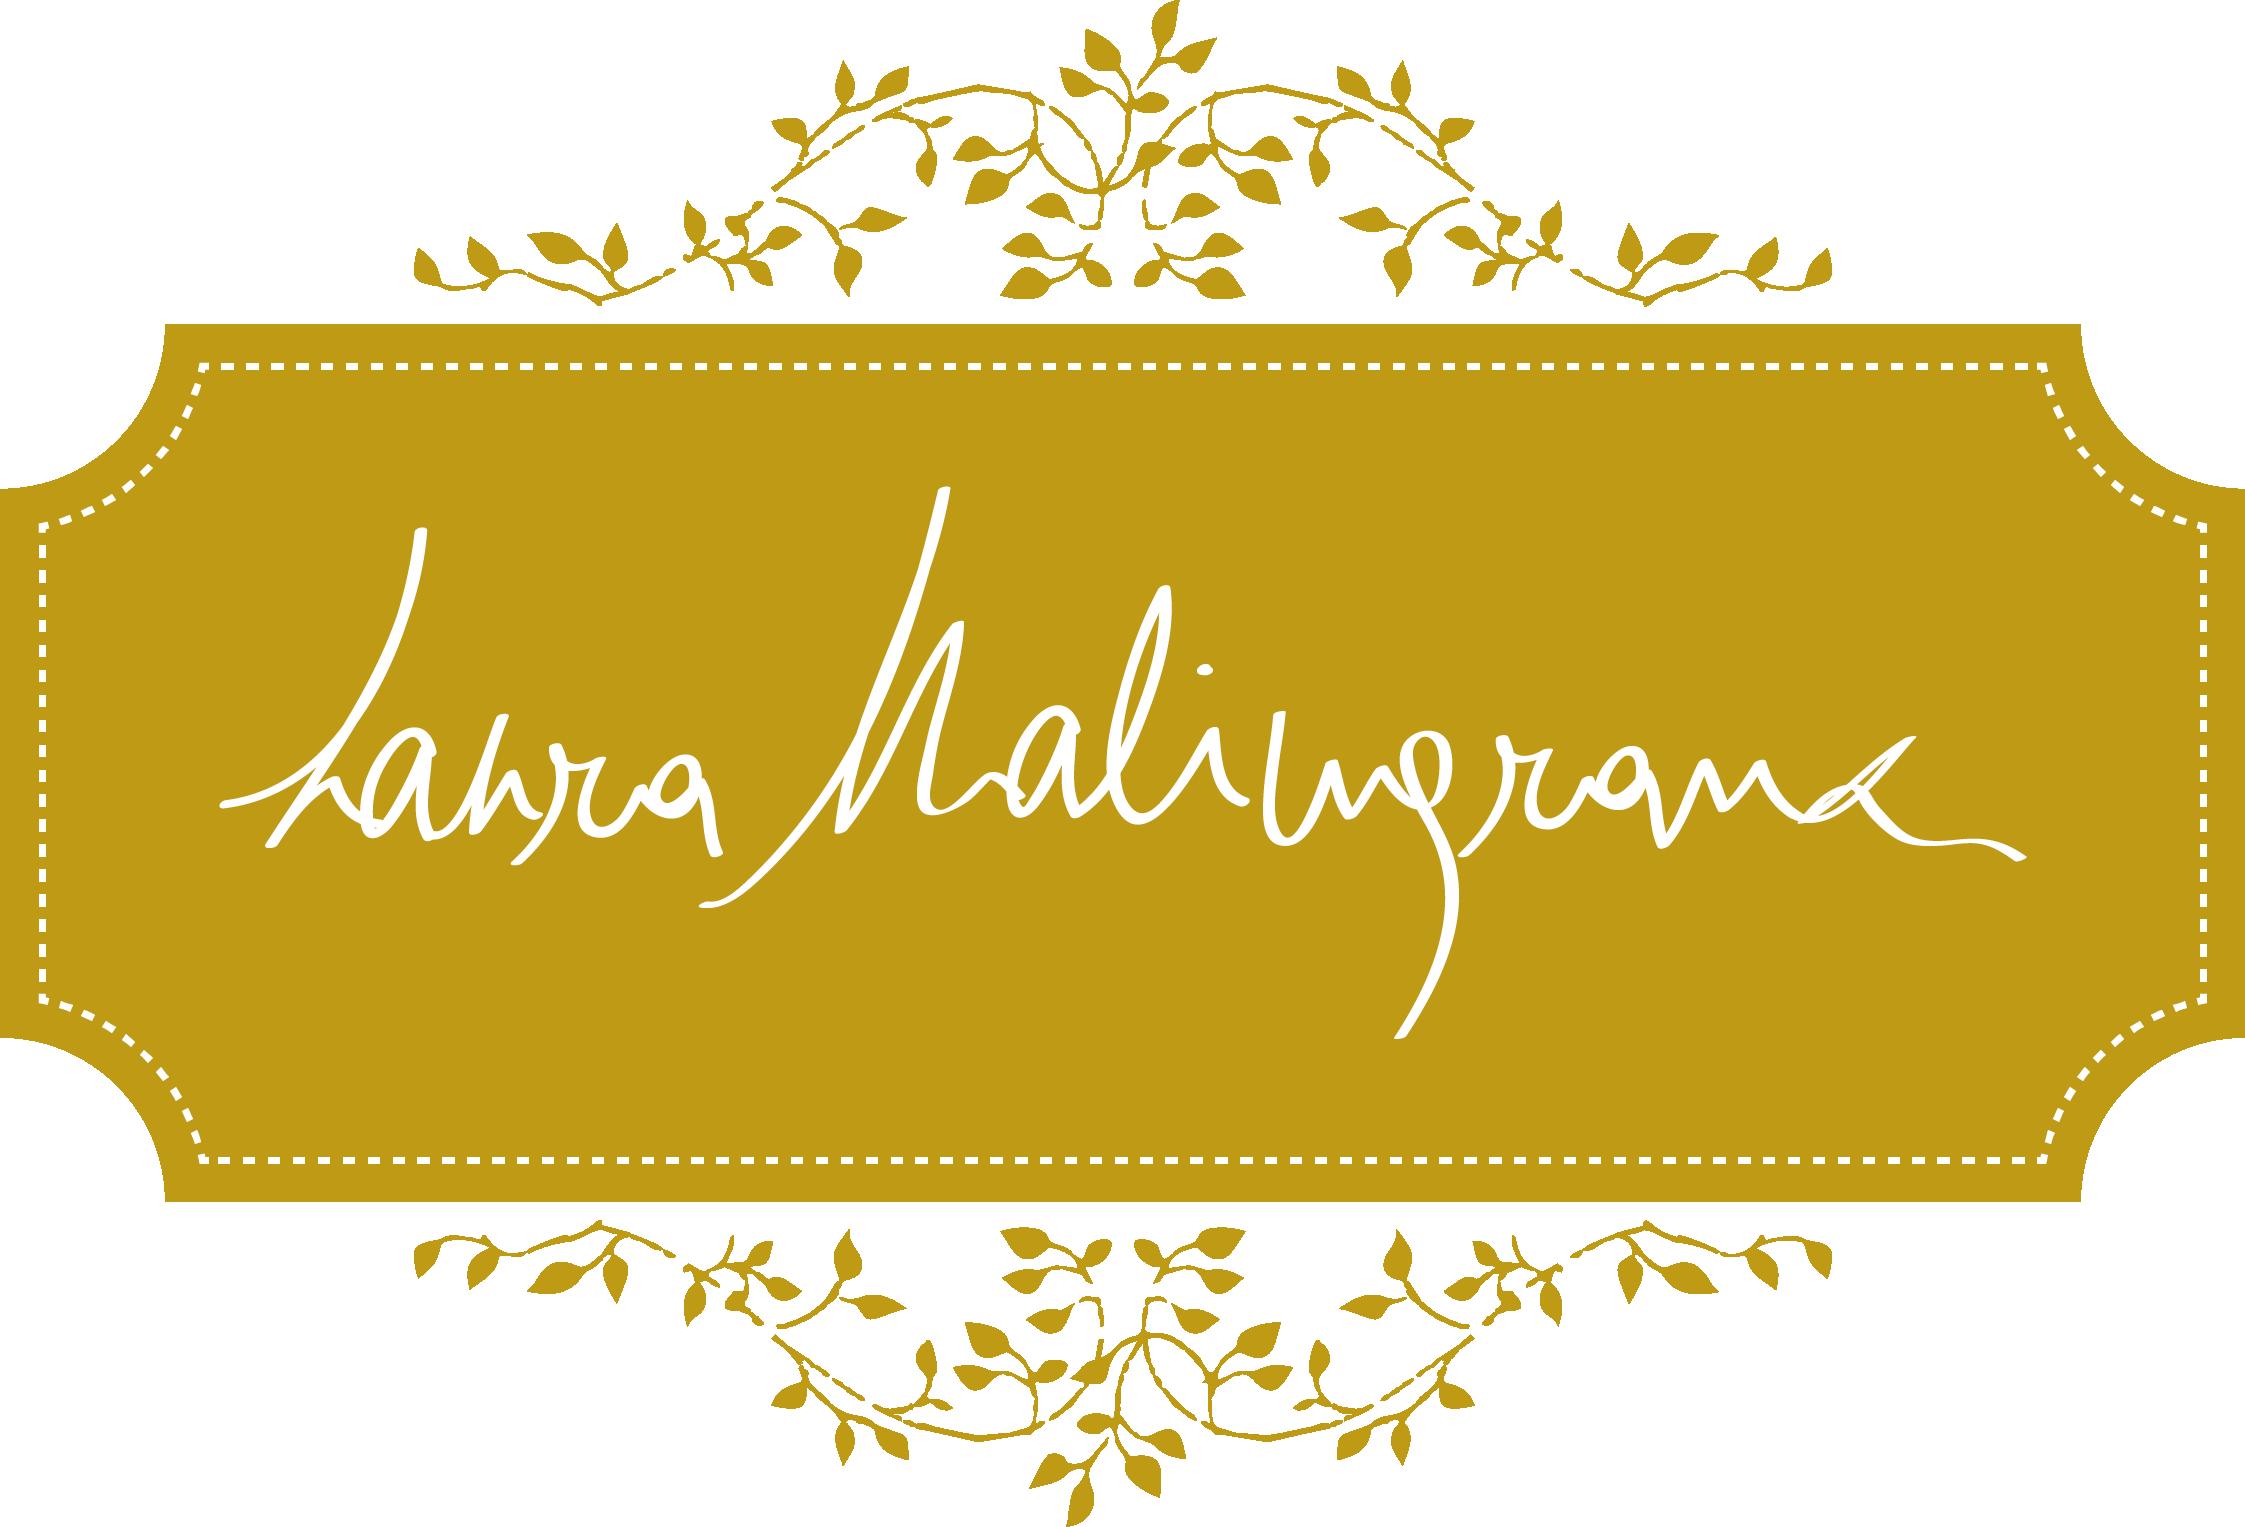 Laura Malingraux - Atelier en Majadahonda